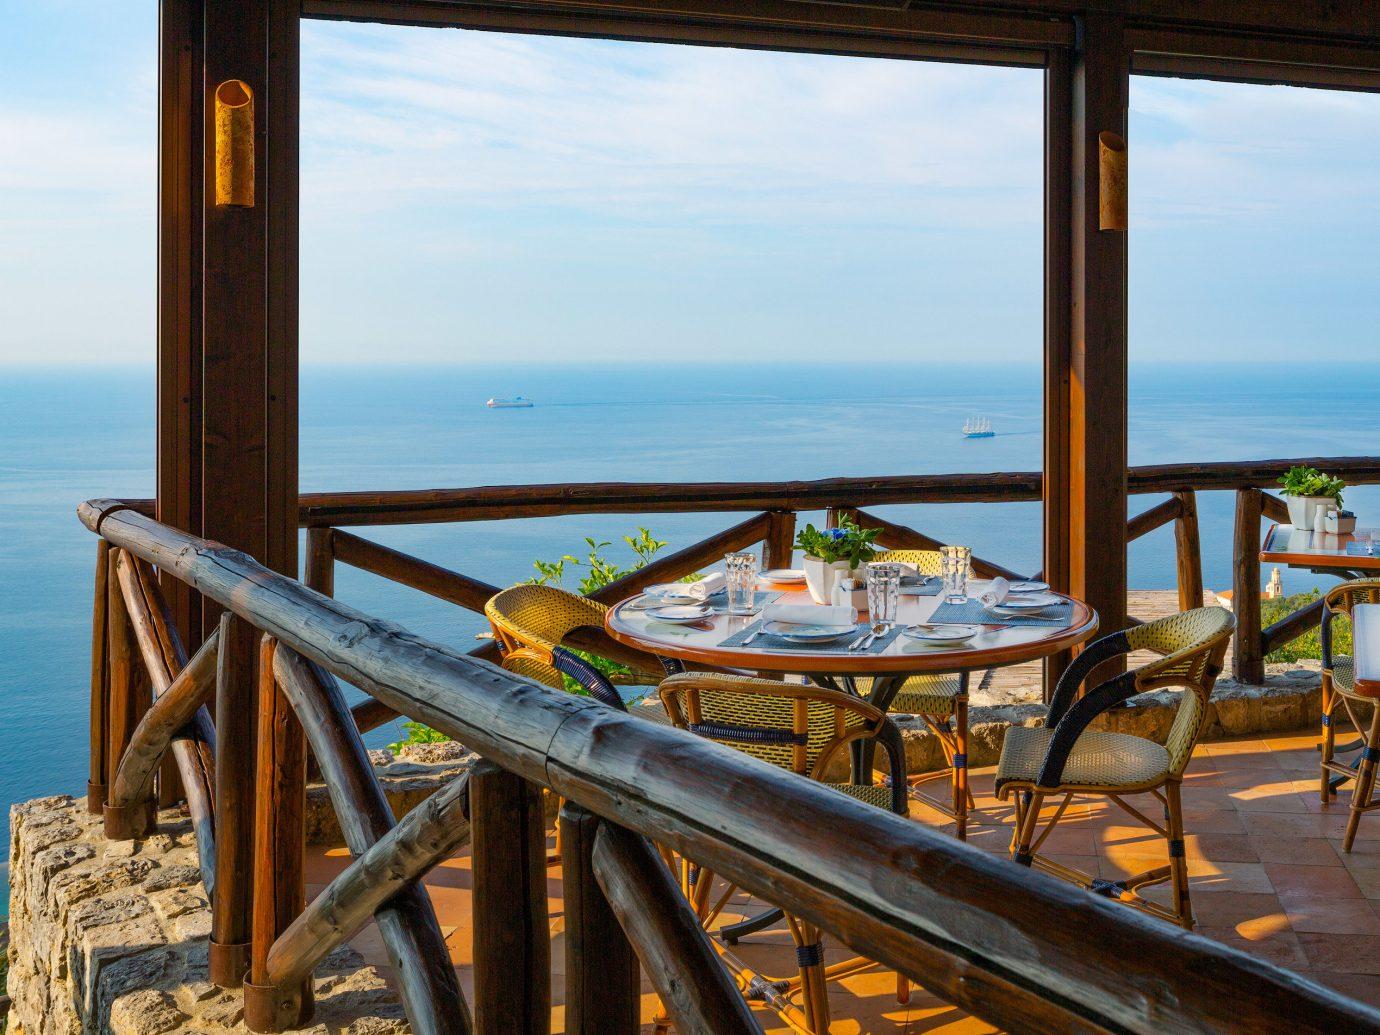 Ocean view from a restaurant at Monastero Santa Rosa, Conca dei Marini